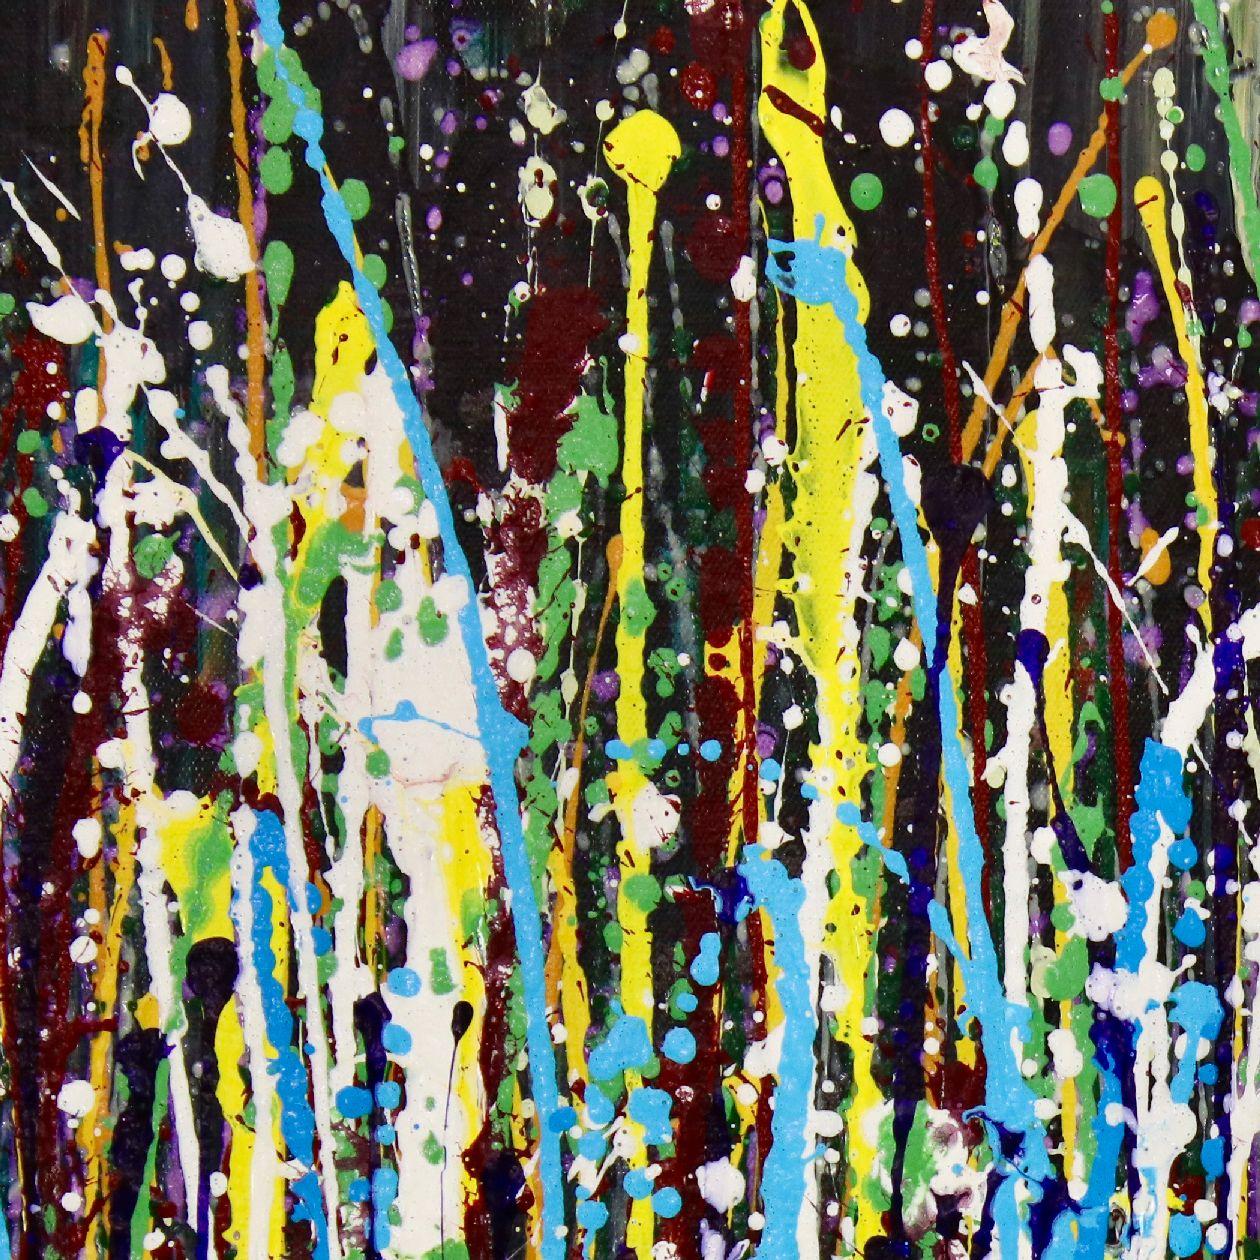 Detail - A Sinful Garden (anochecer) by Nestor Toro